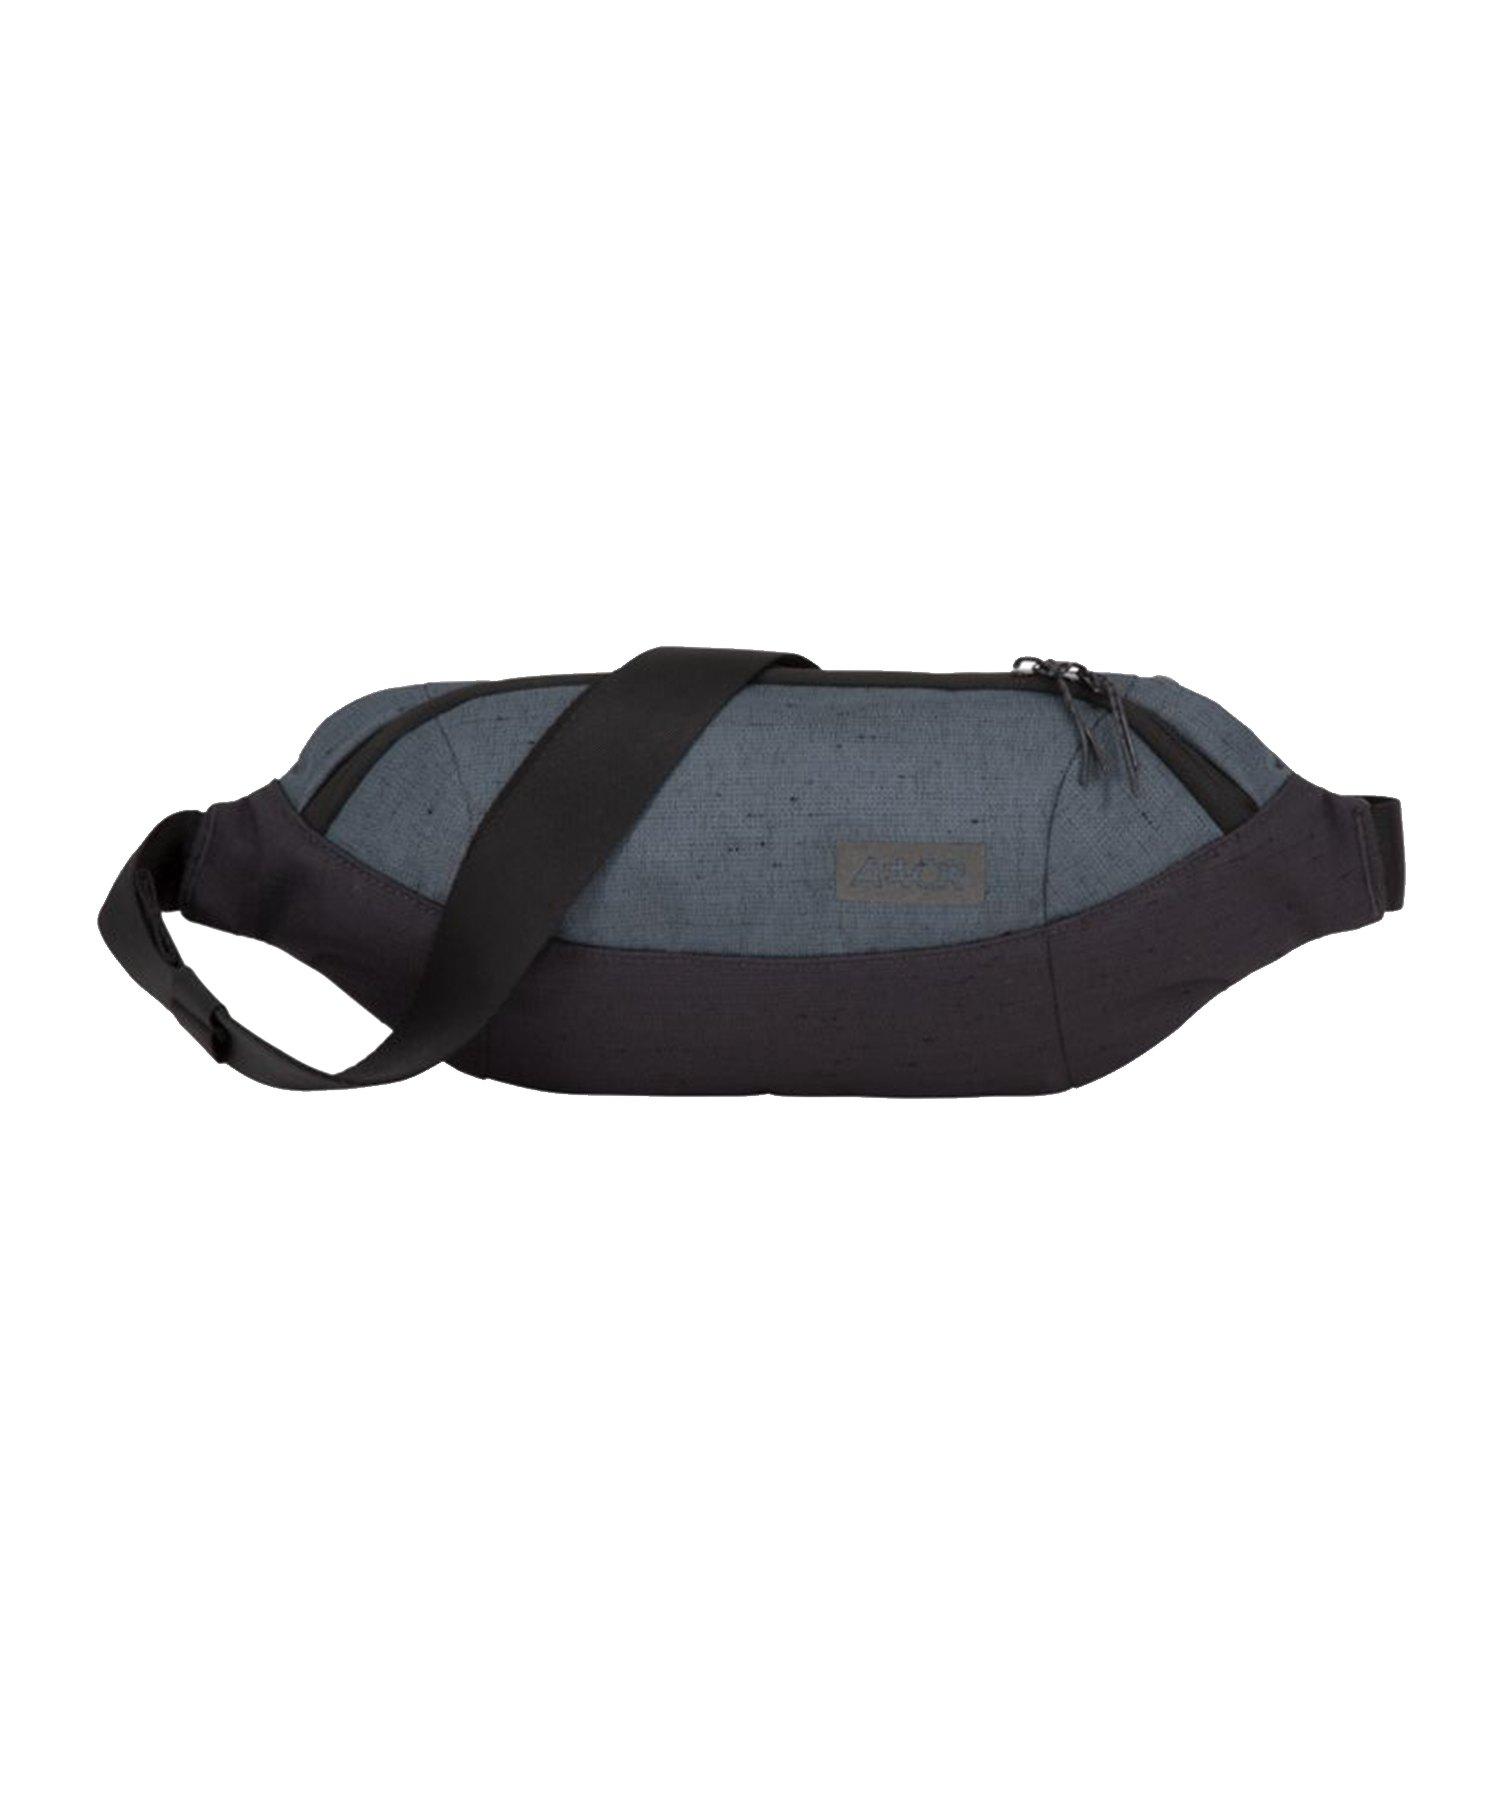 AEVOR Backpack Shoulderbag Rucksack Grau F9N6 - grau